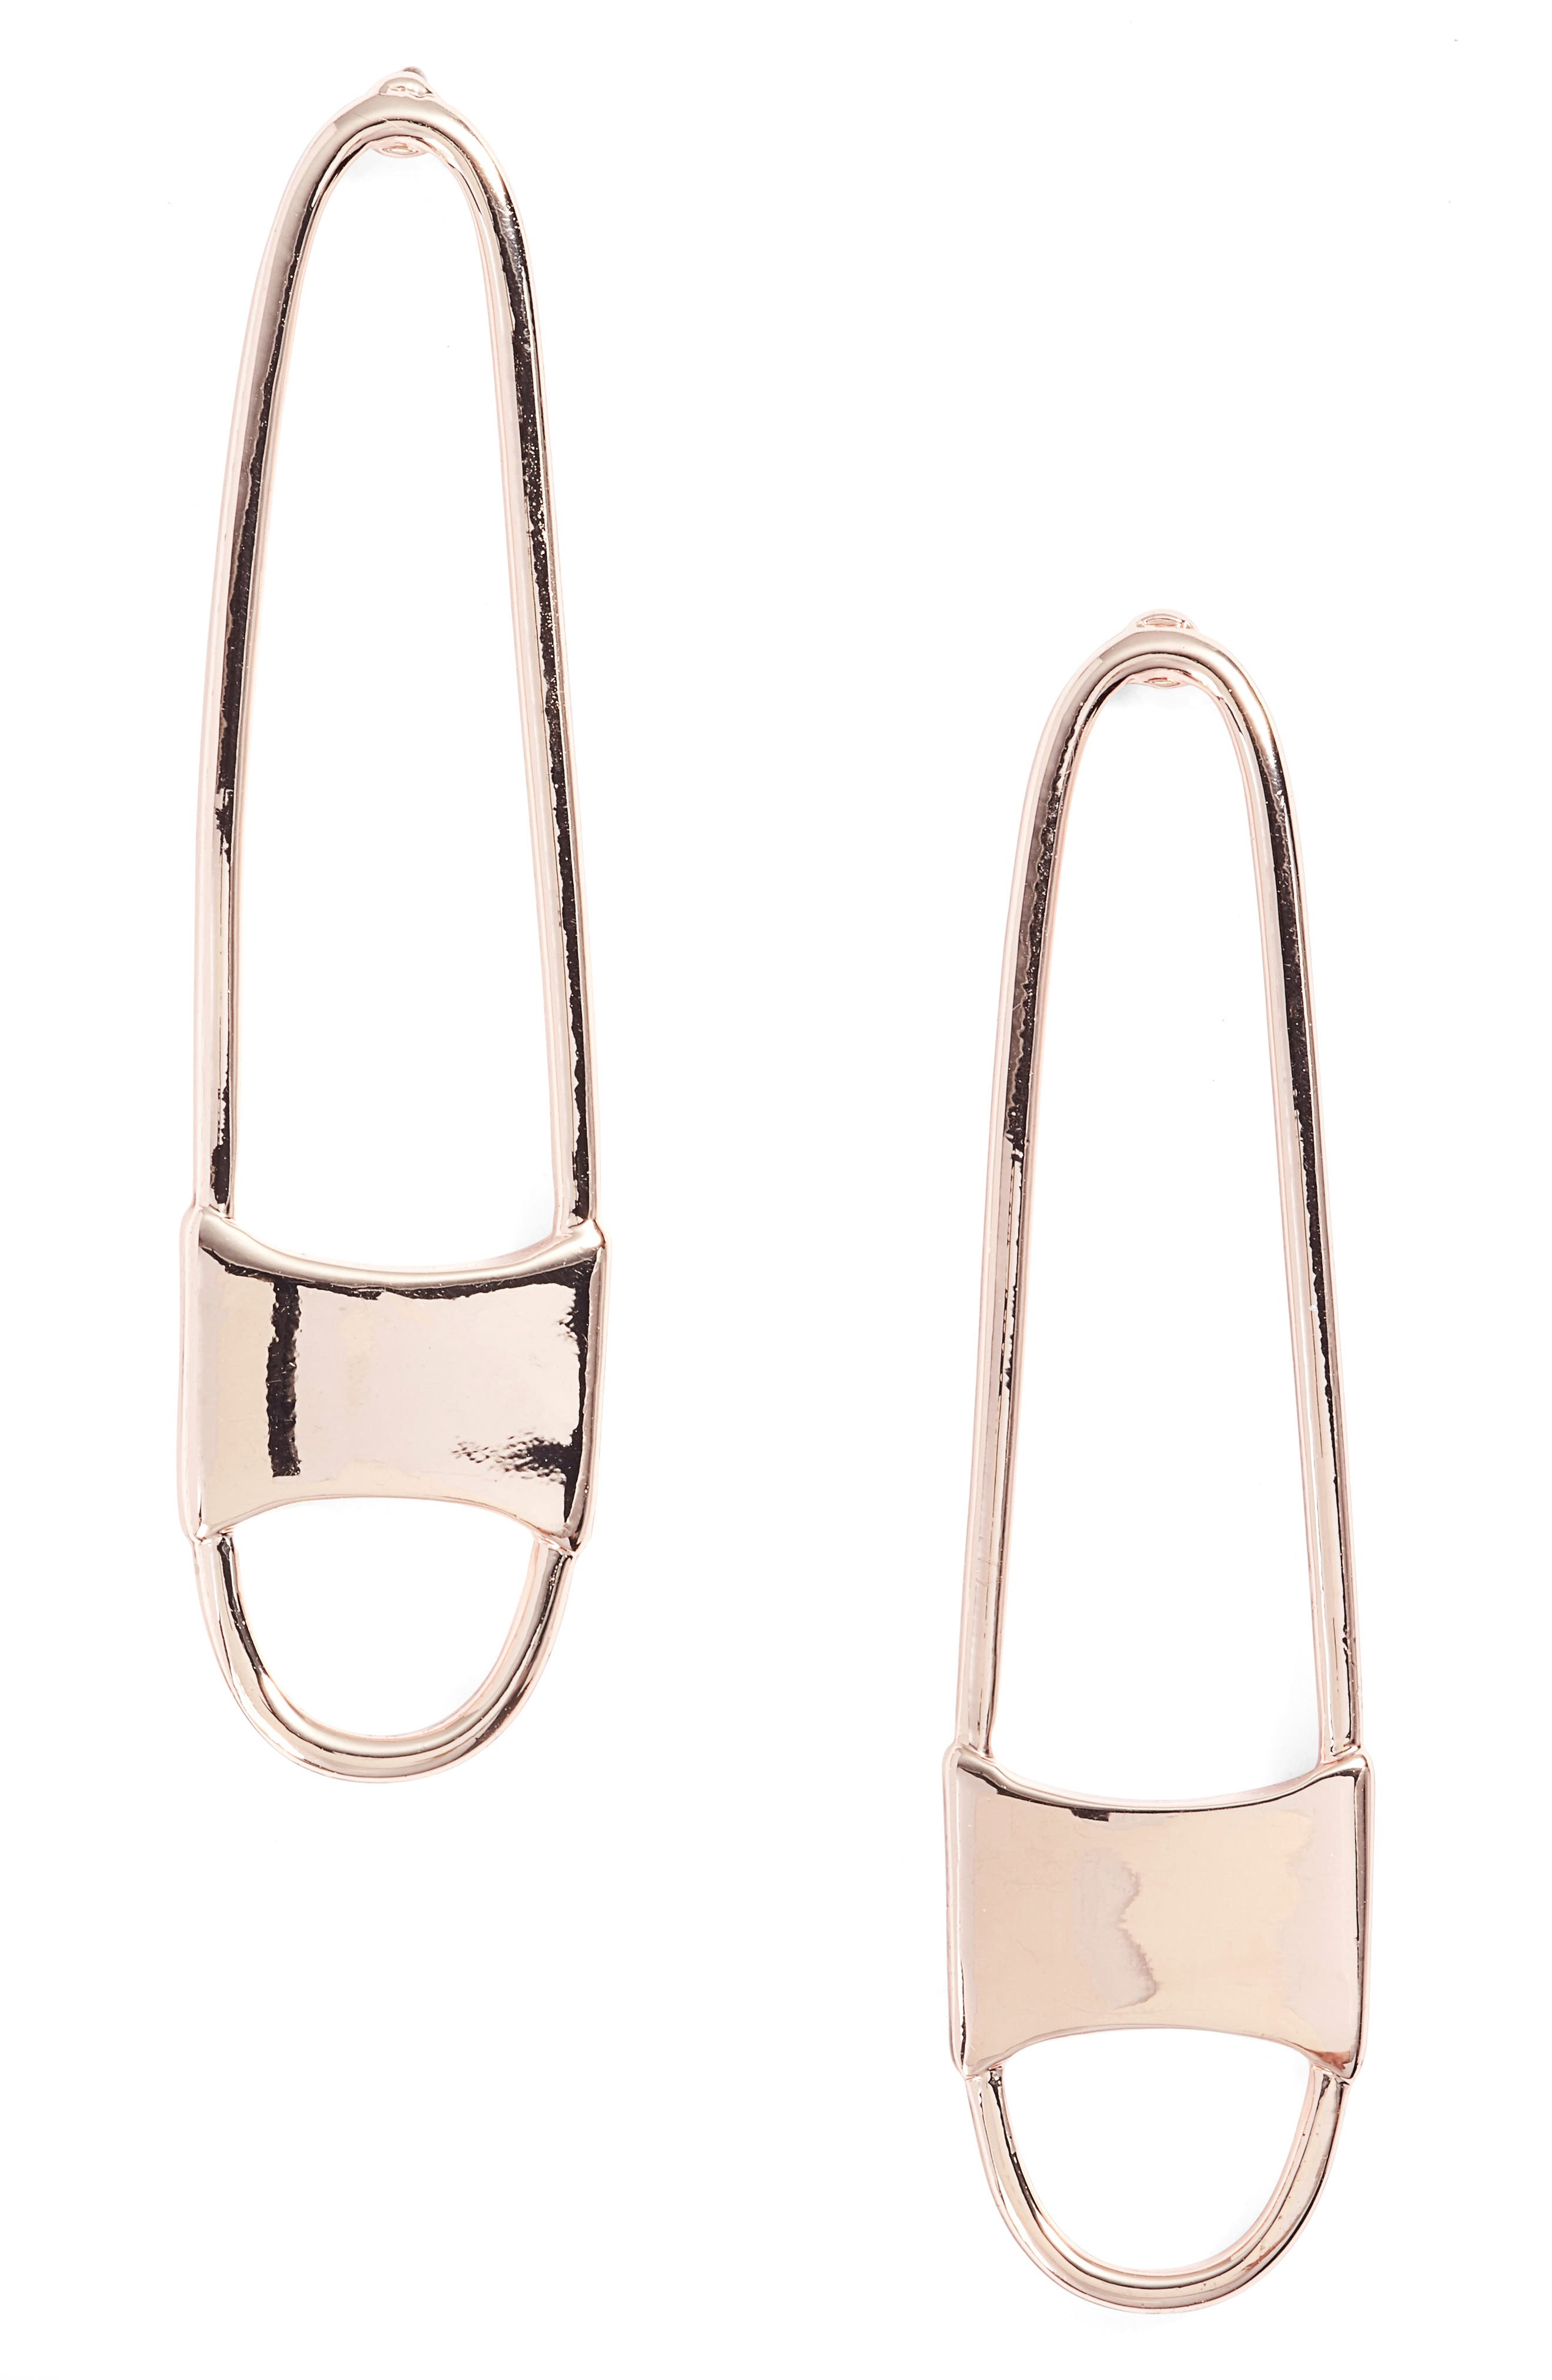 Alternate Image 1 Selected - Rebecca Minkoff Runway Pin Drop Earrings